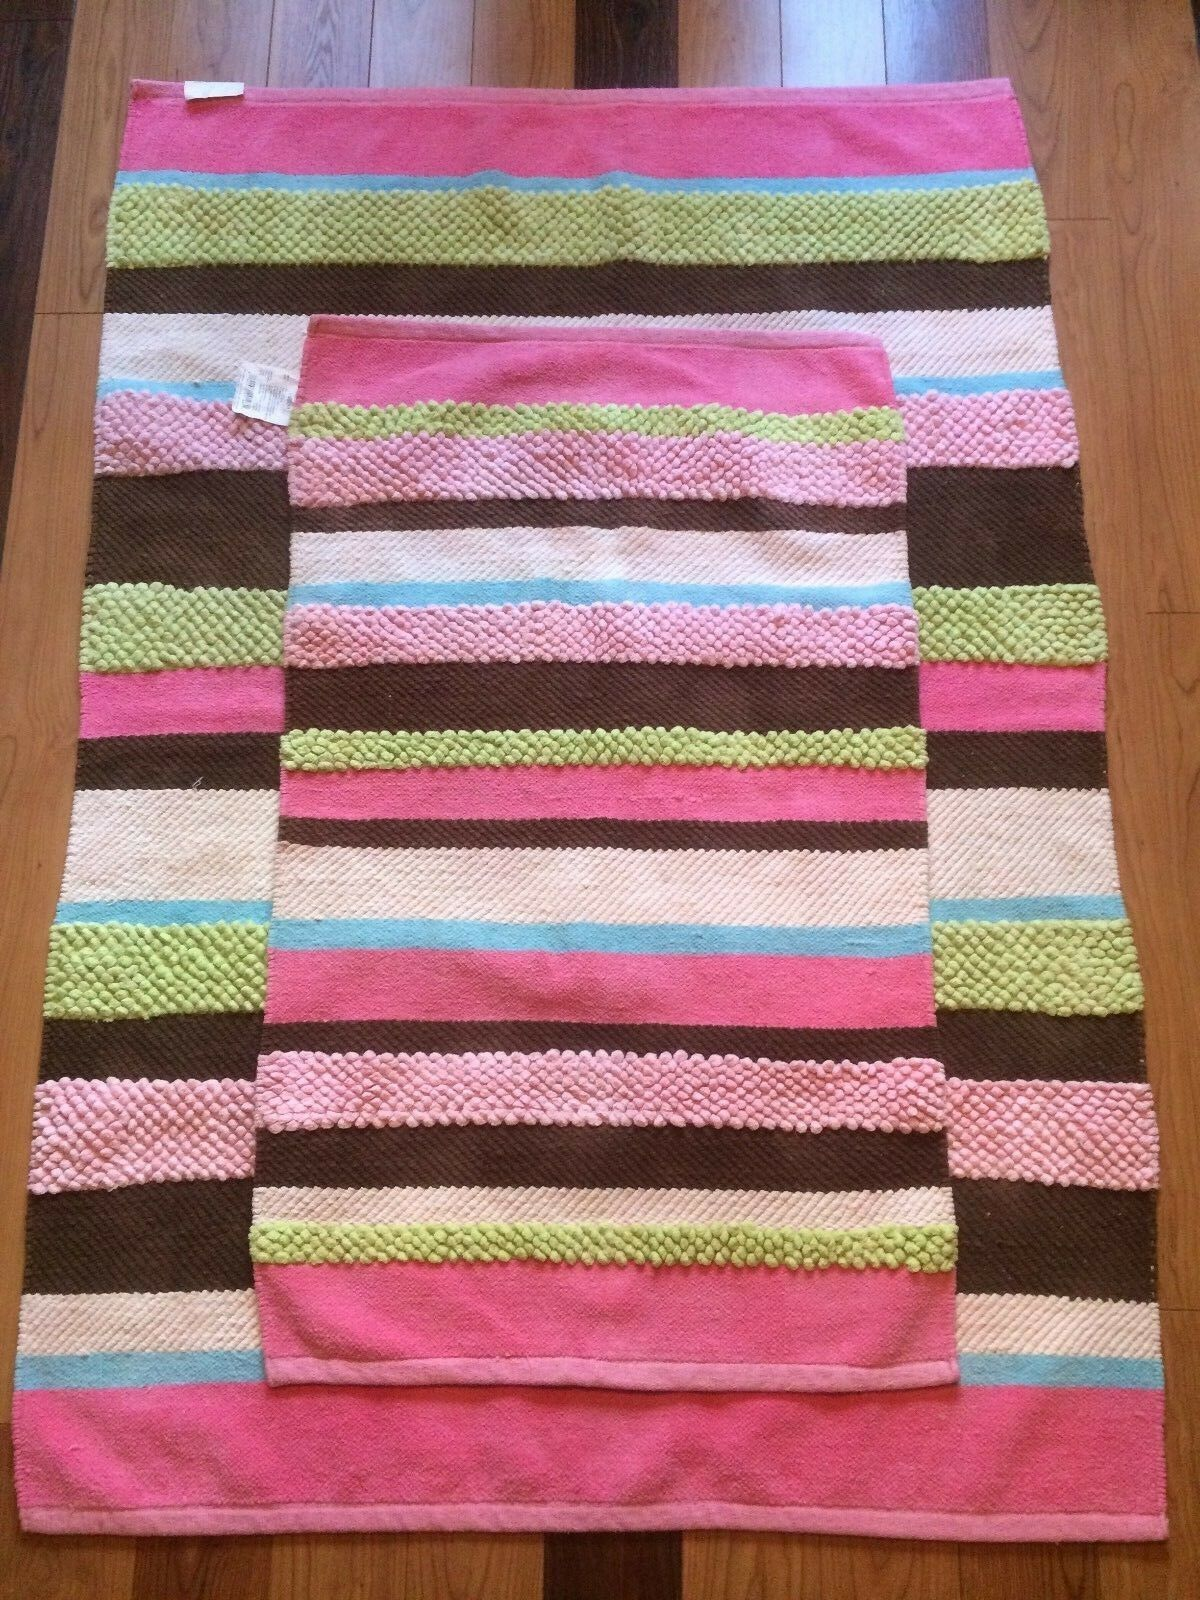 2 Throw Area Rugs, Circo Brand, Multi-Couleuruge, Texturouge, Striped, 46x67 & 29x48